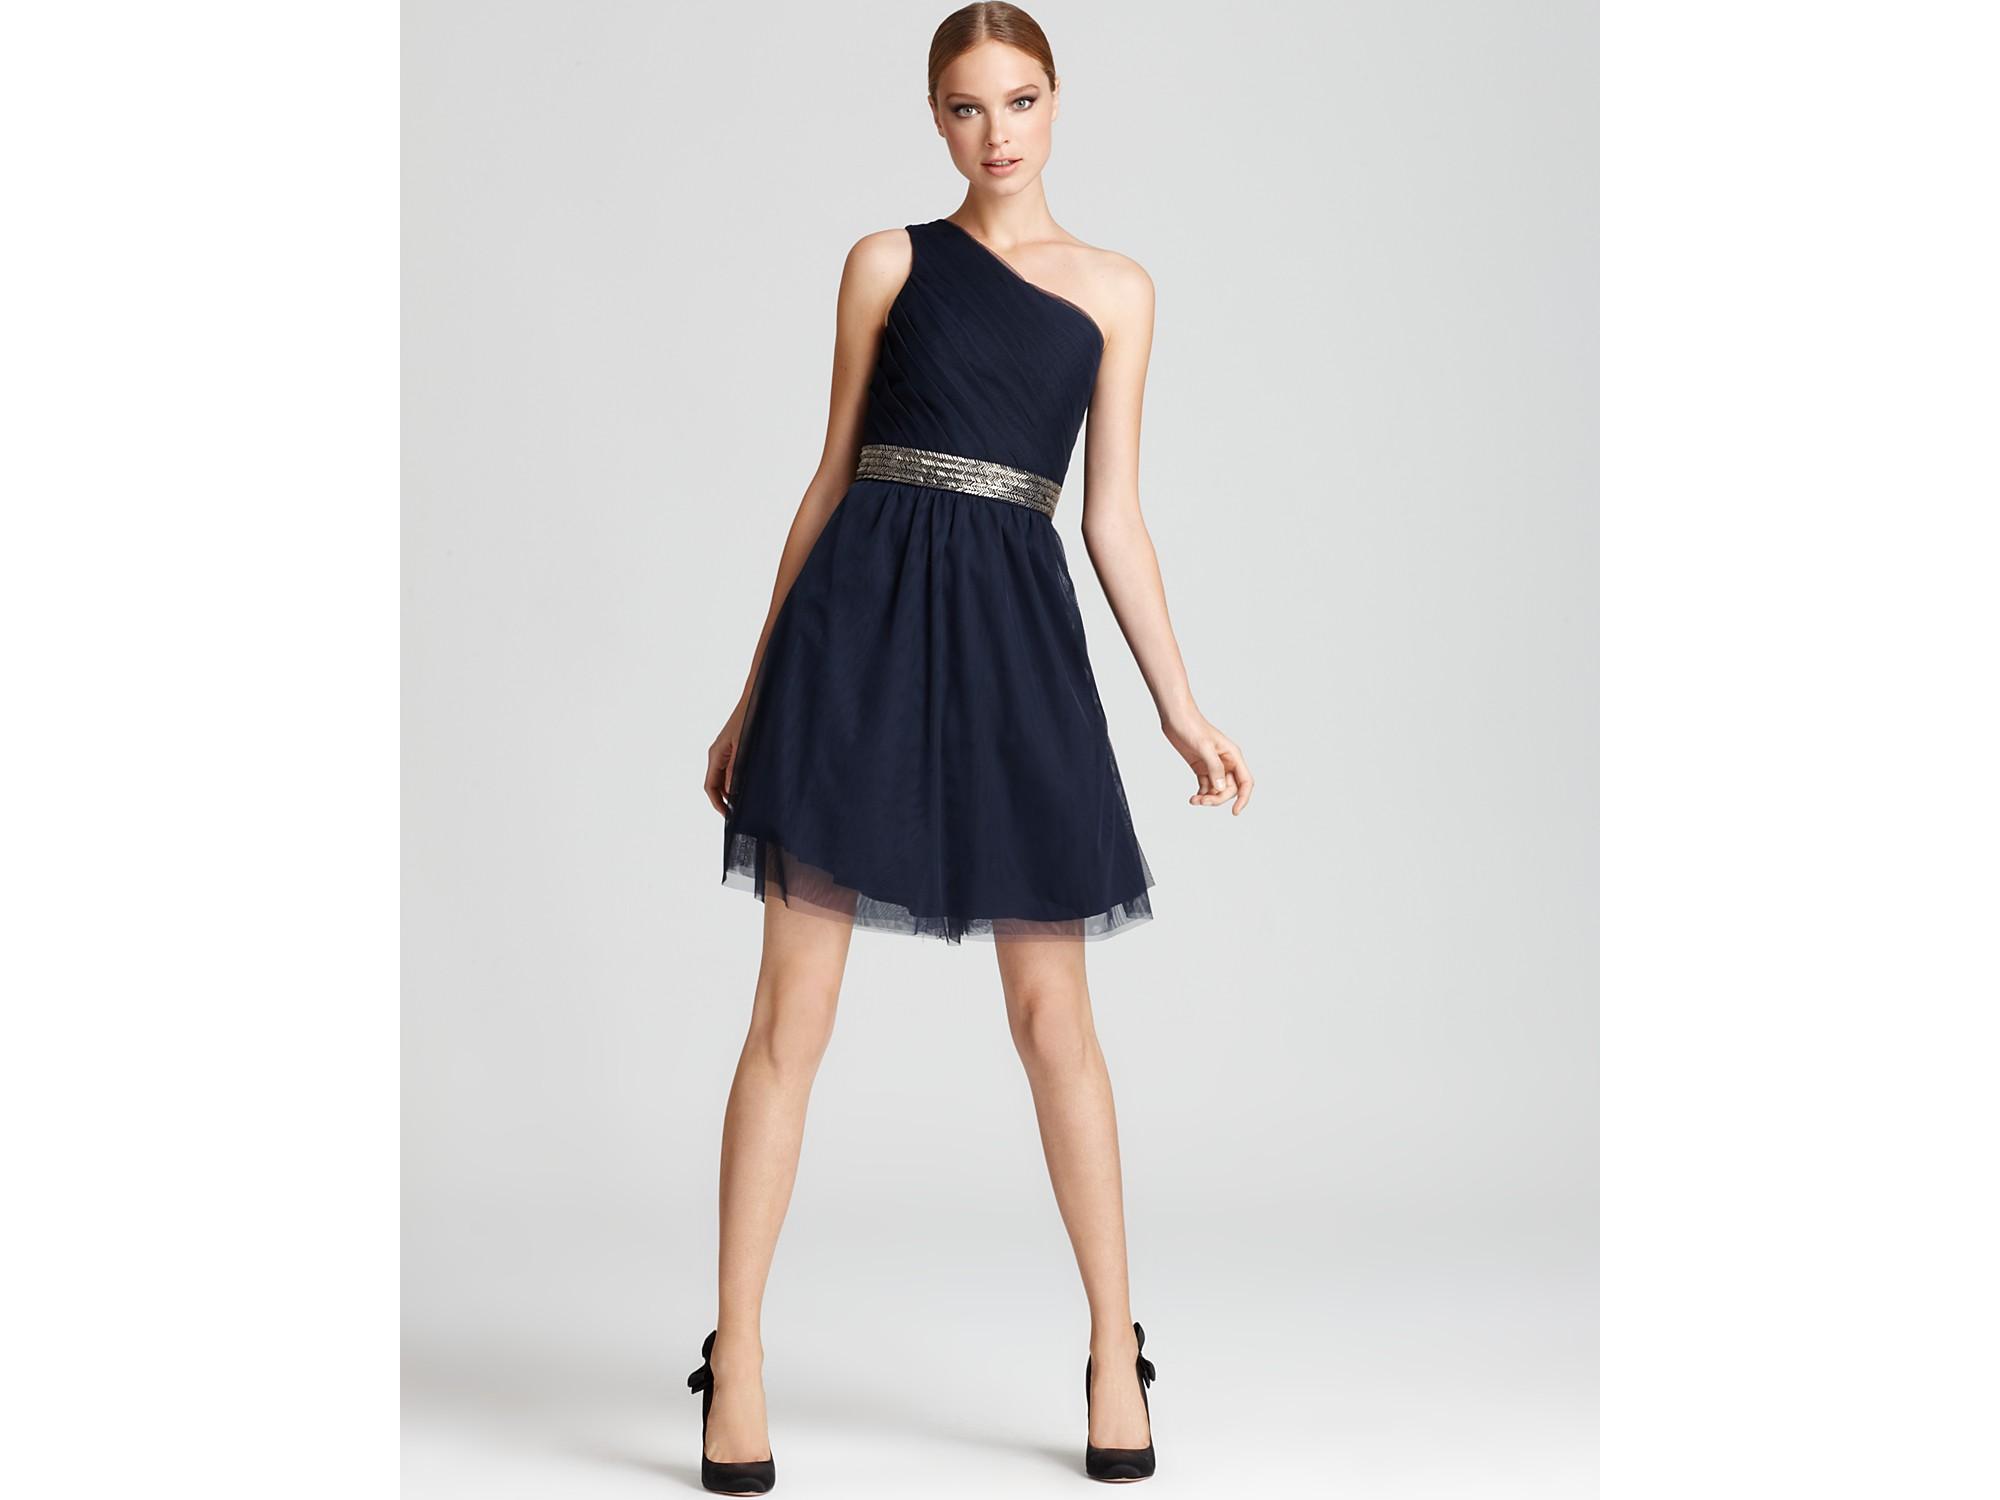 Lyst - Max & Cleo One Shoulder Dress Brianna in Black